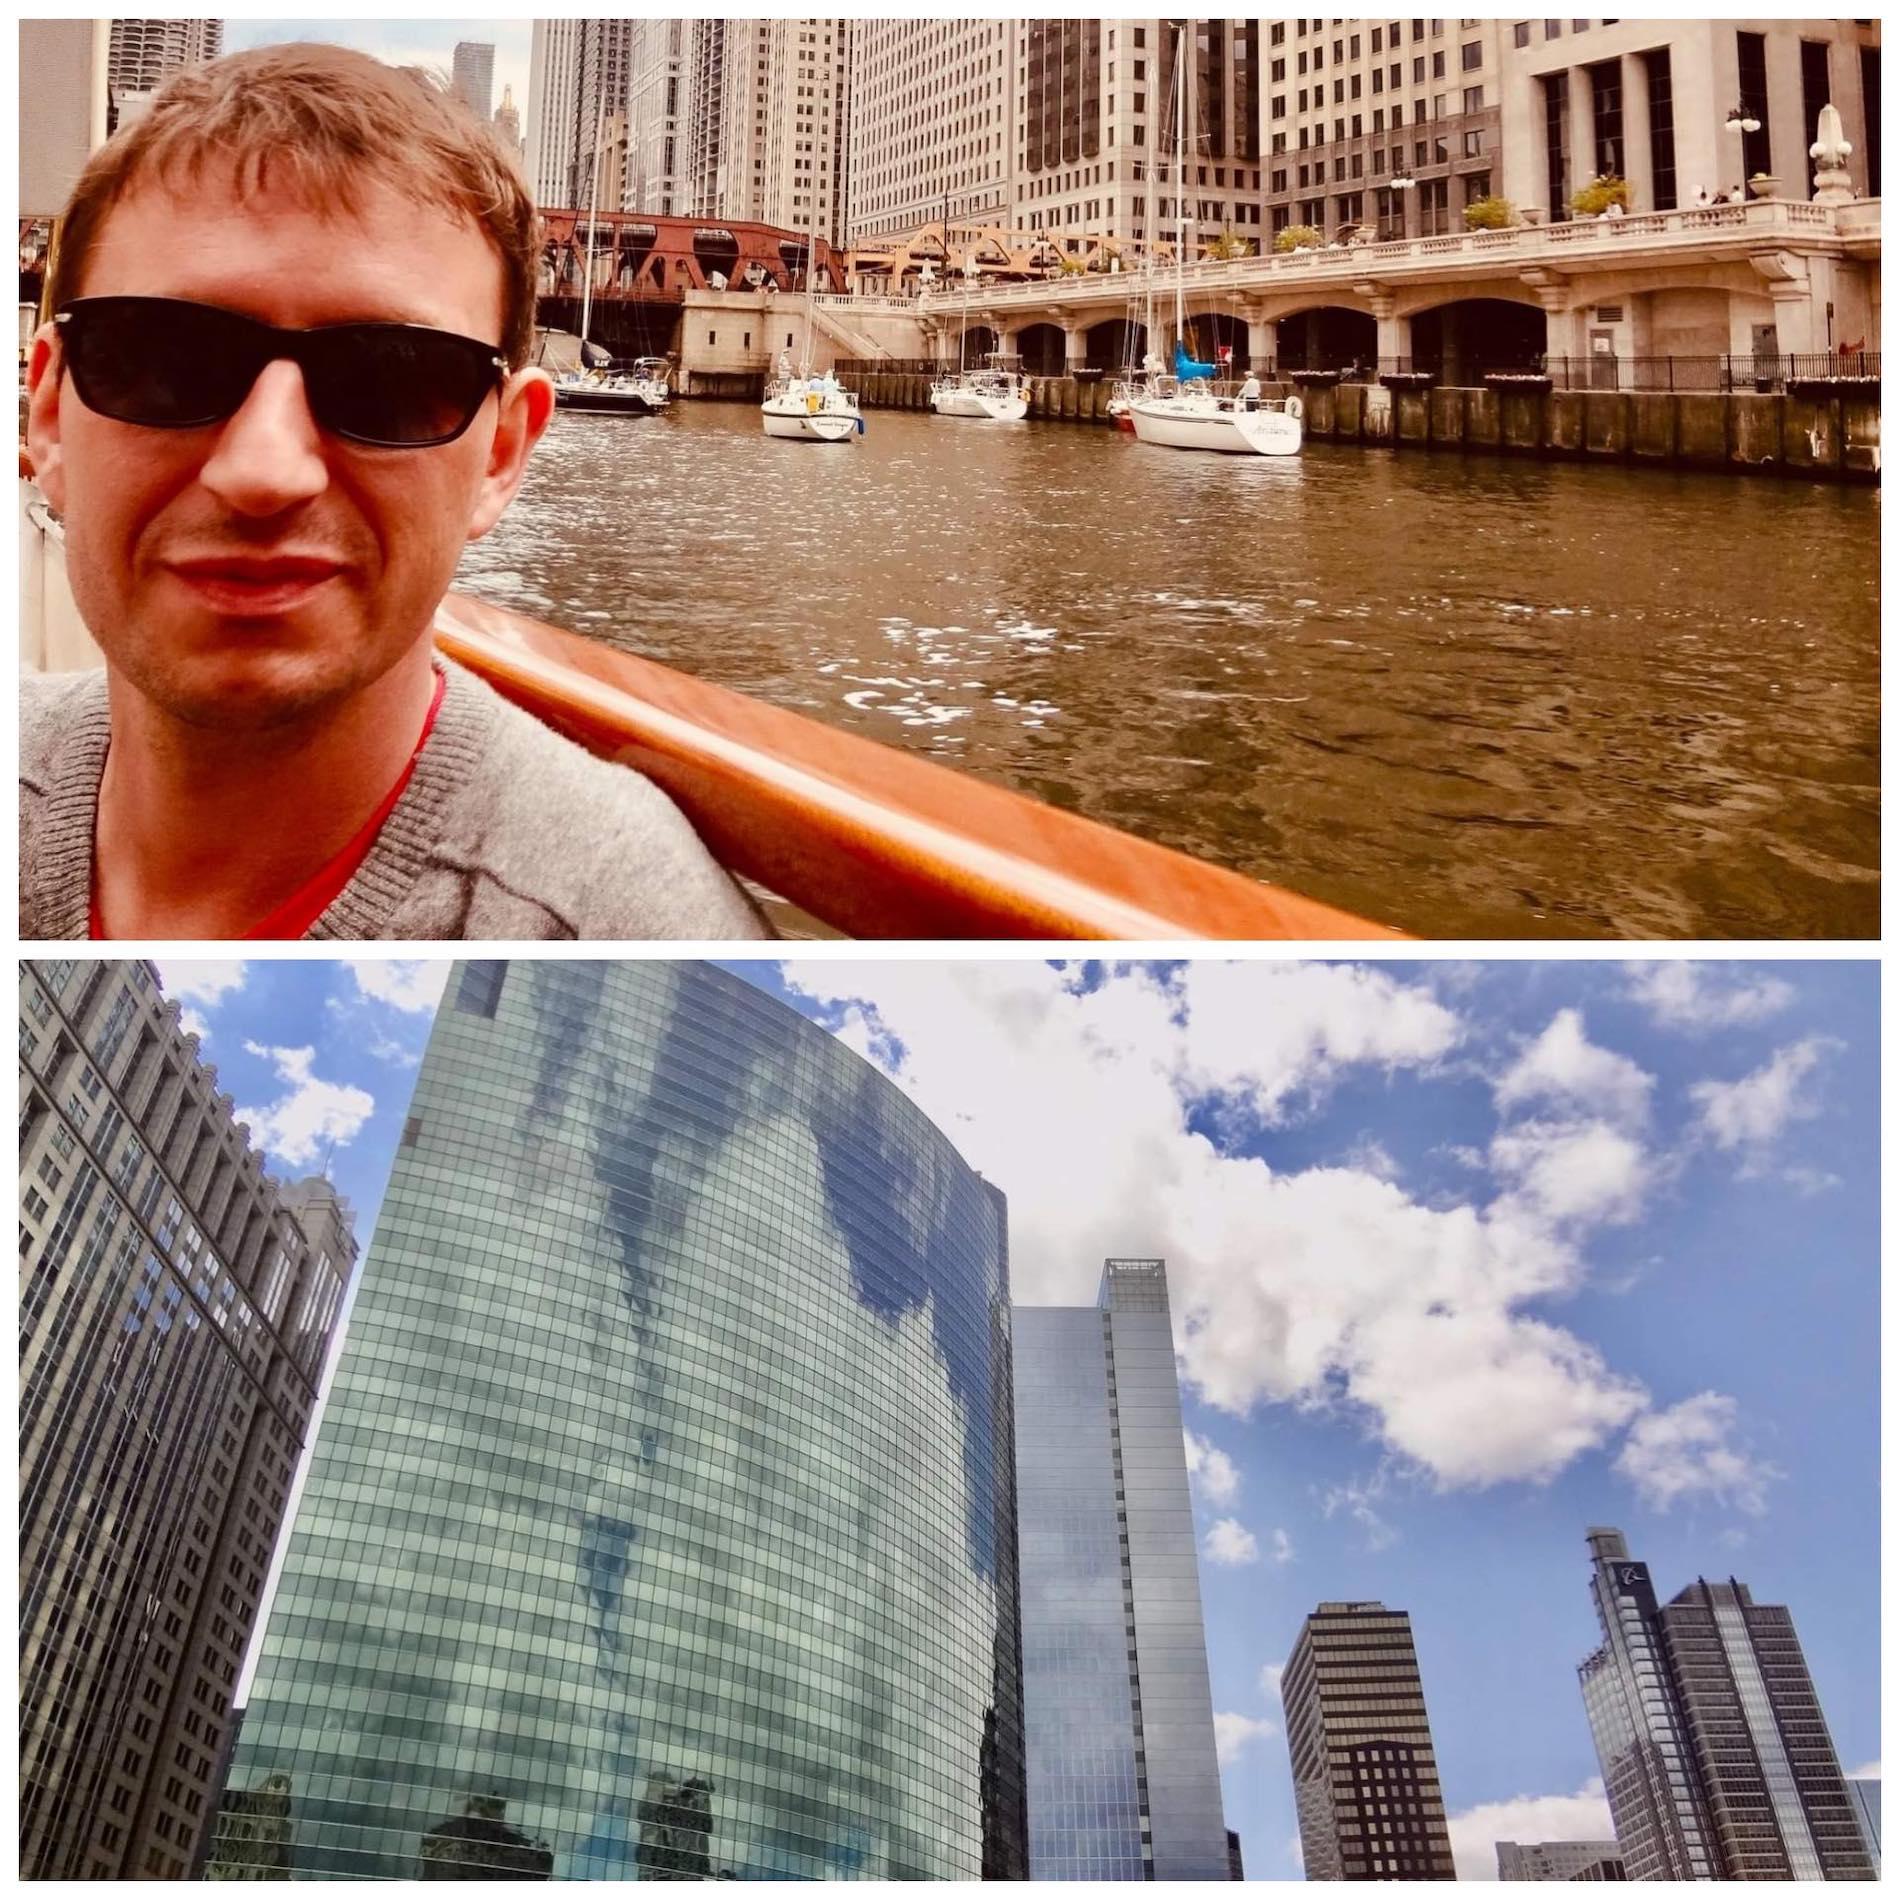 Chicago Nostalgia Architectural River Cruise